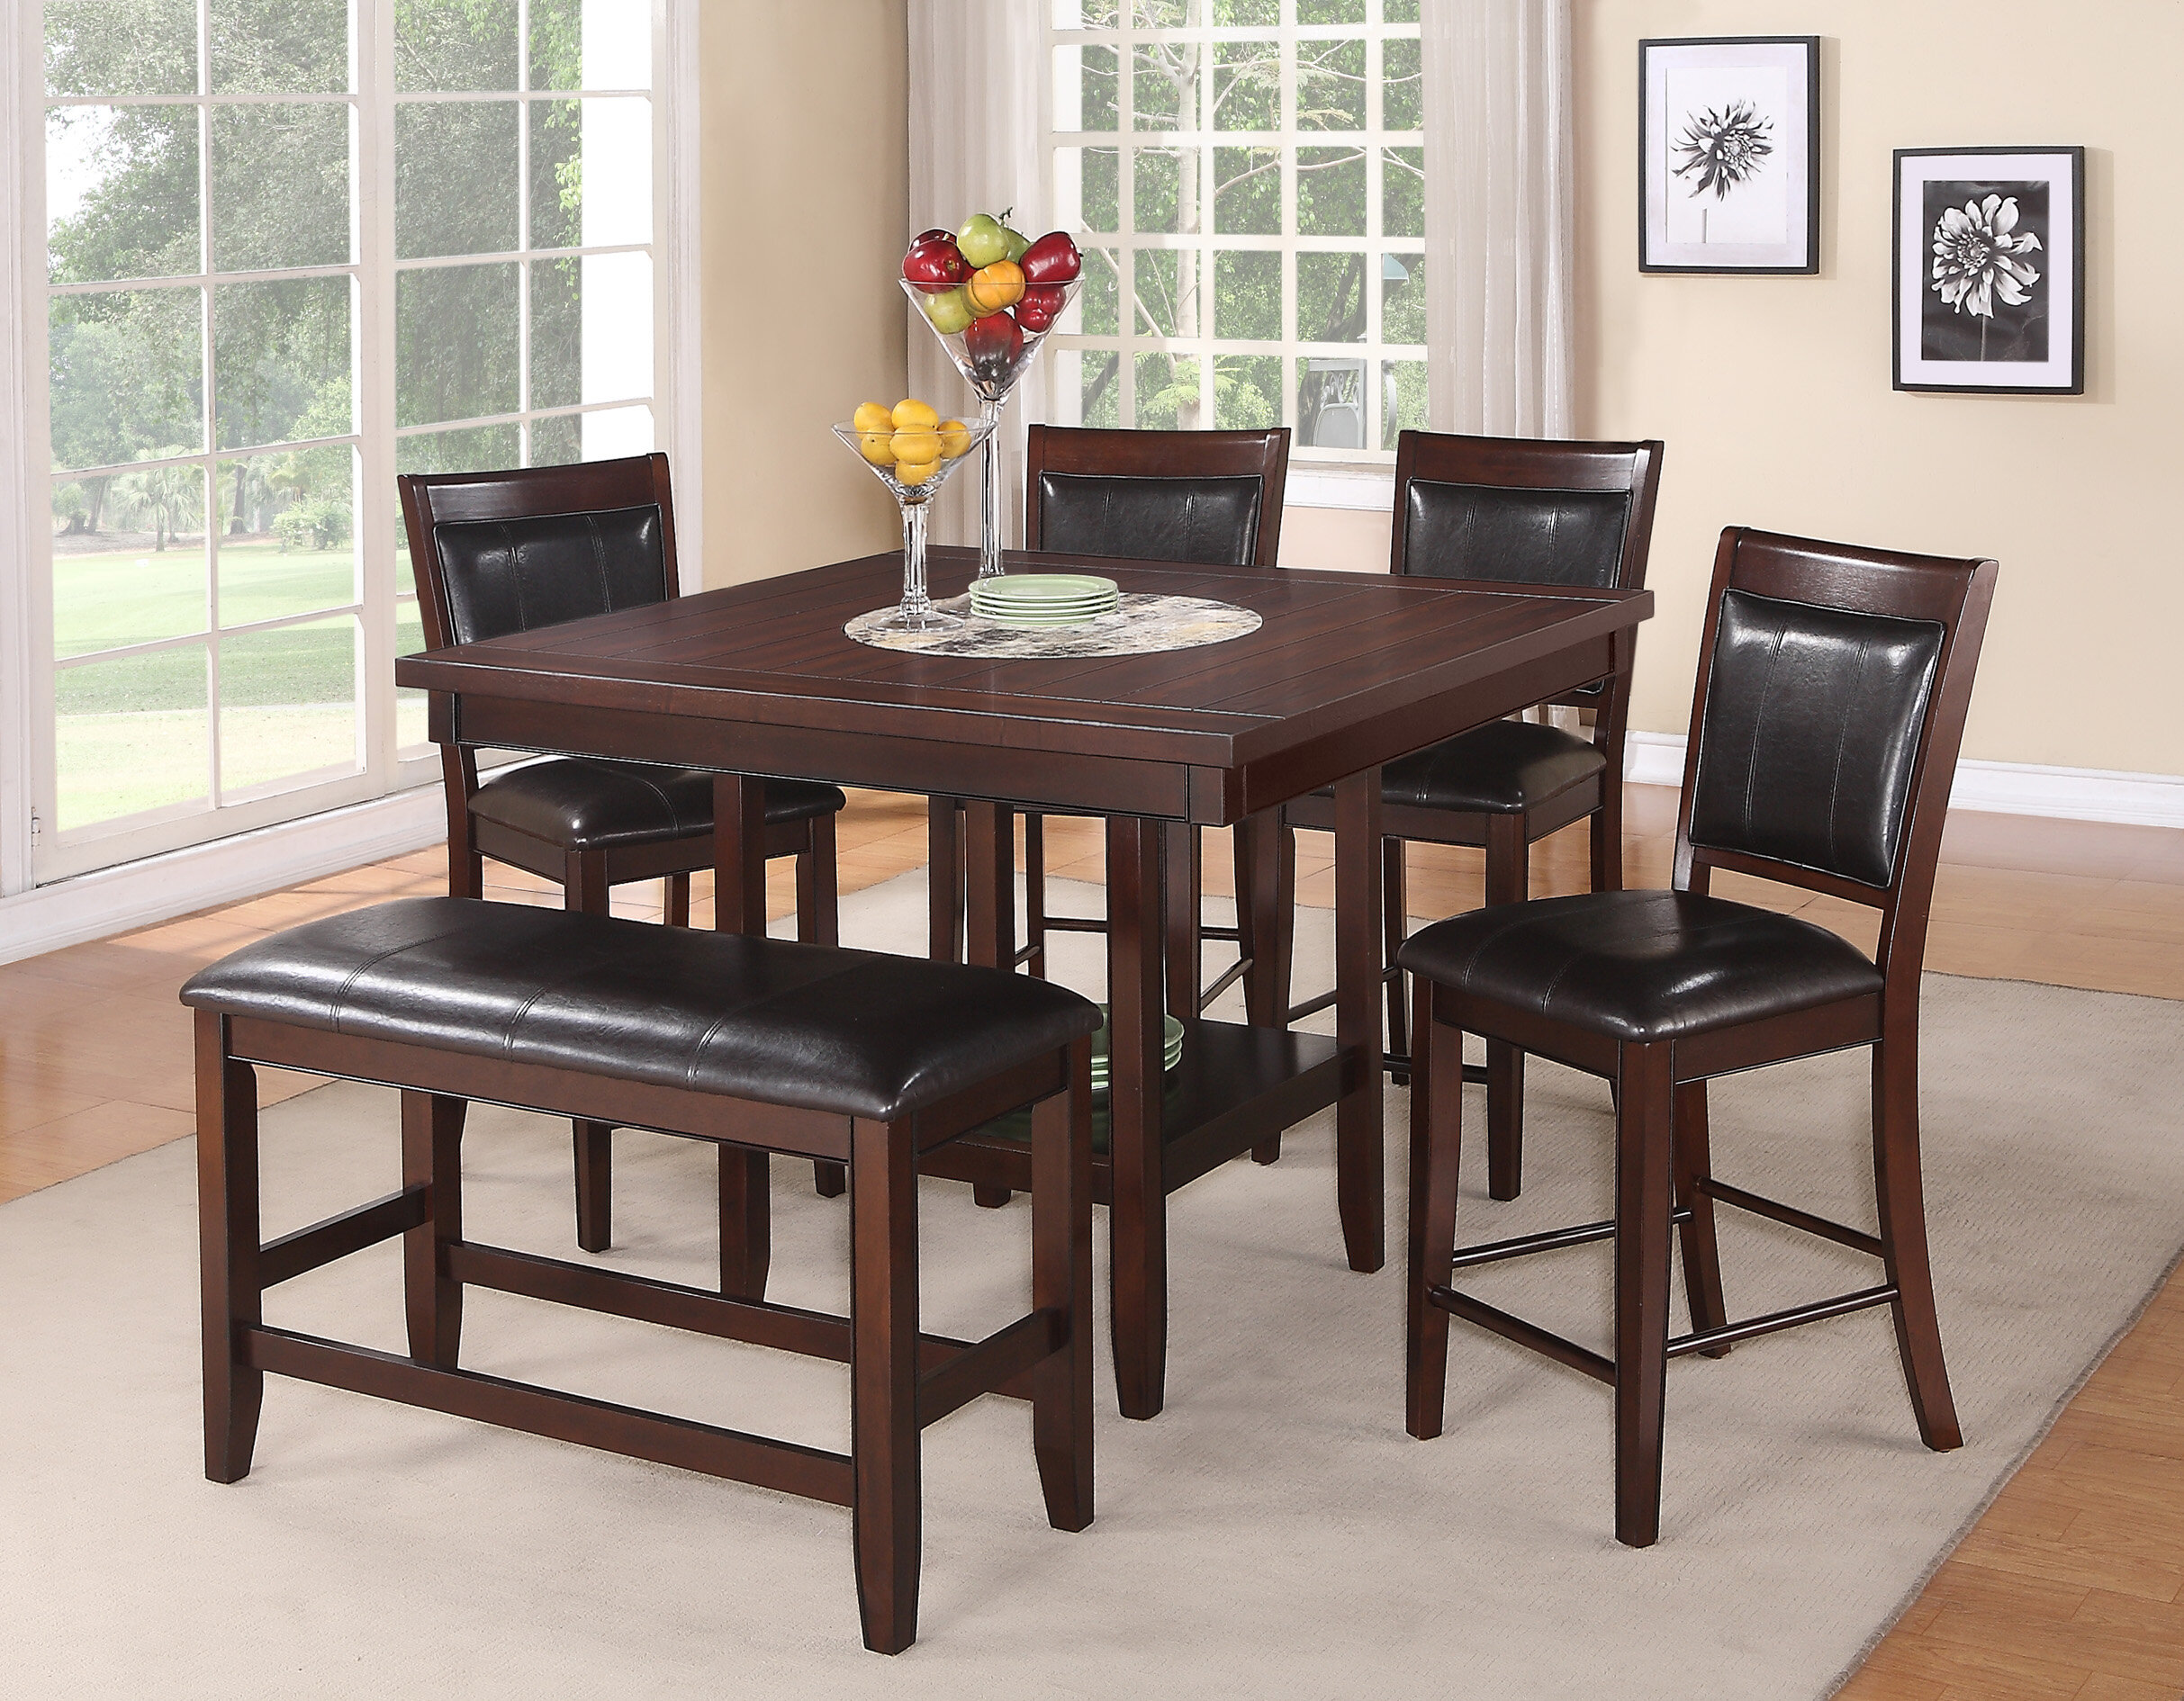 24 Inch High Dining Chairs | Wayfair